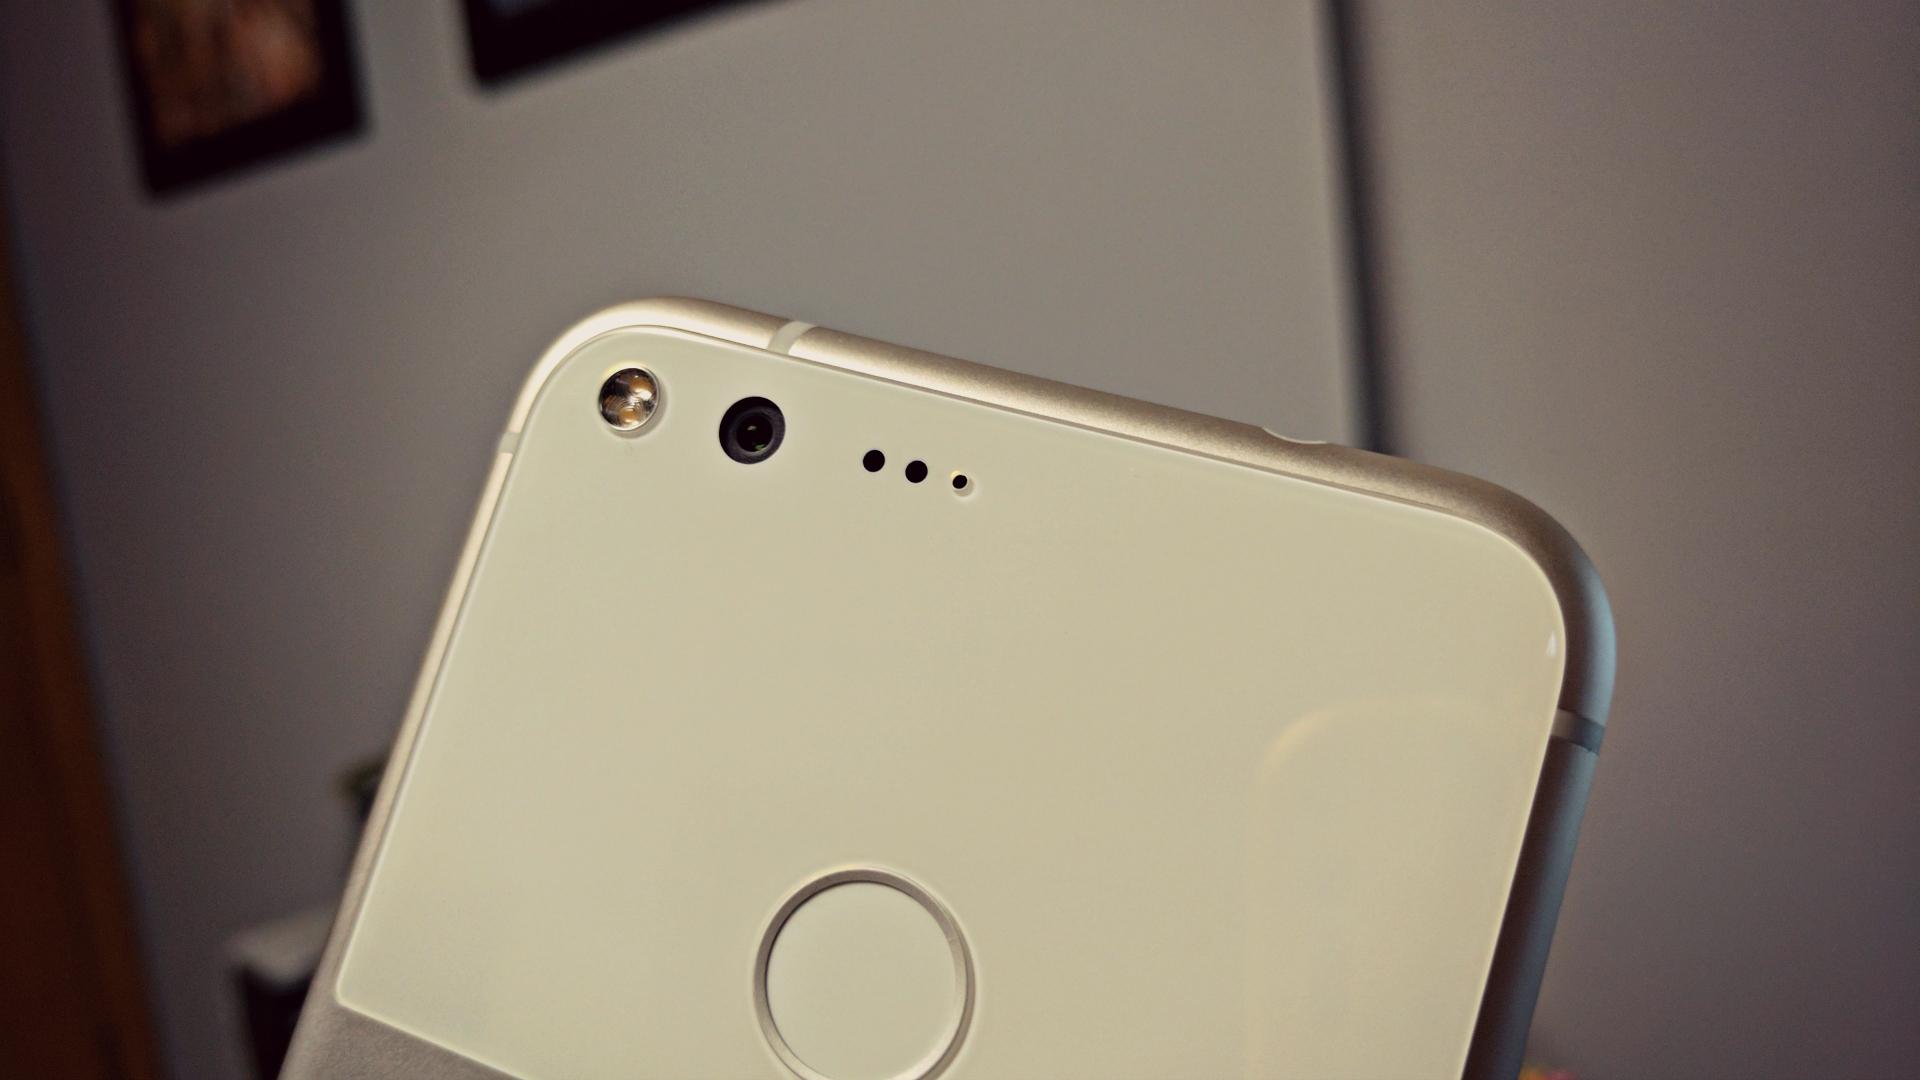 Google Camera HDR+ Port APK updated with Zero Shutter Lag